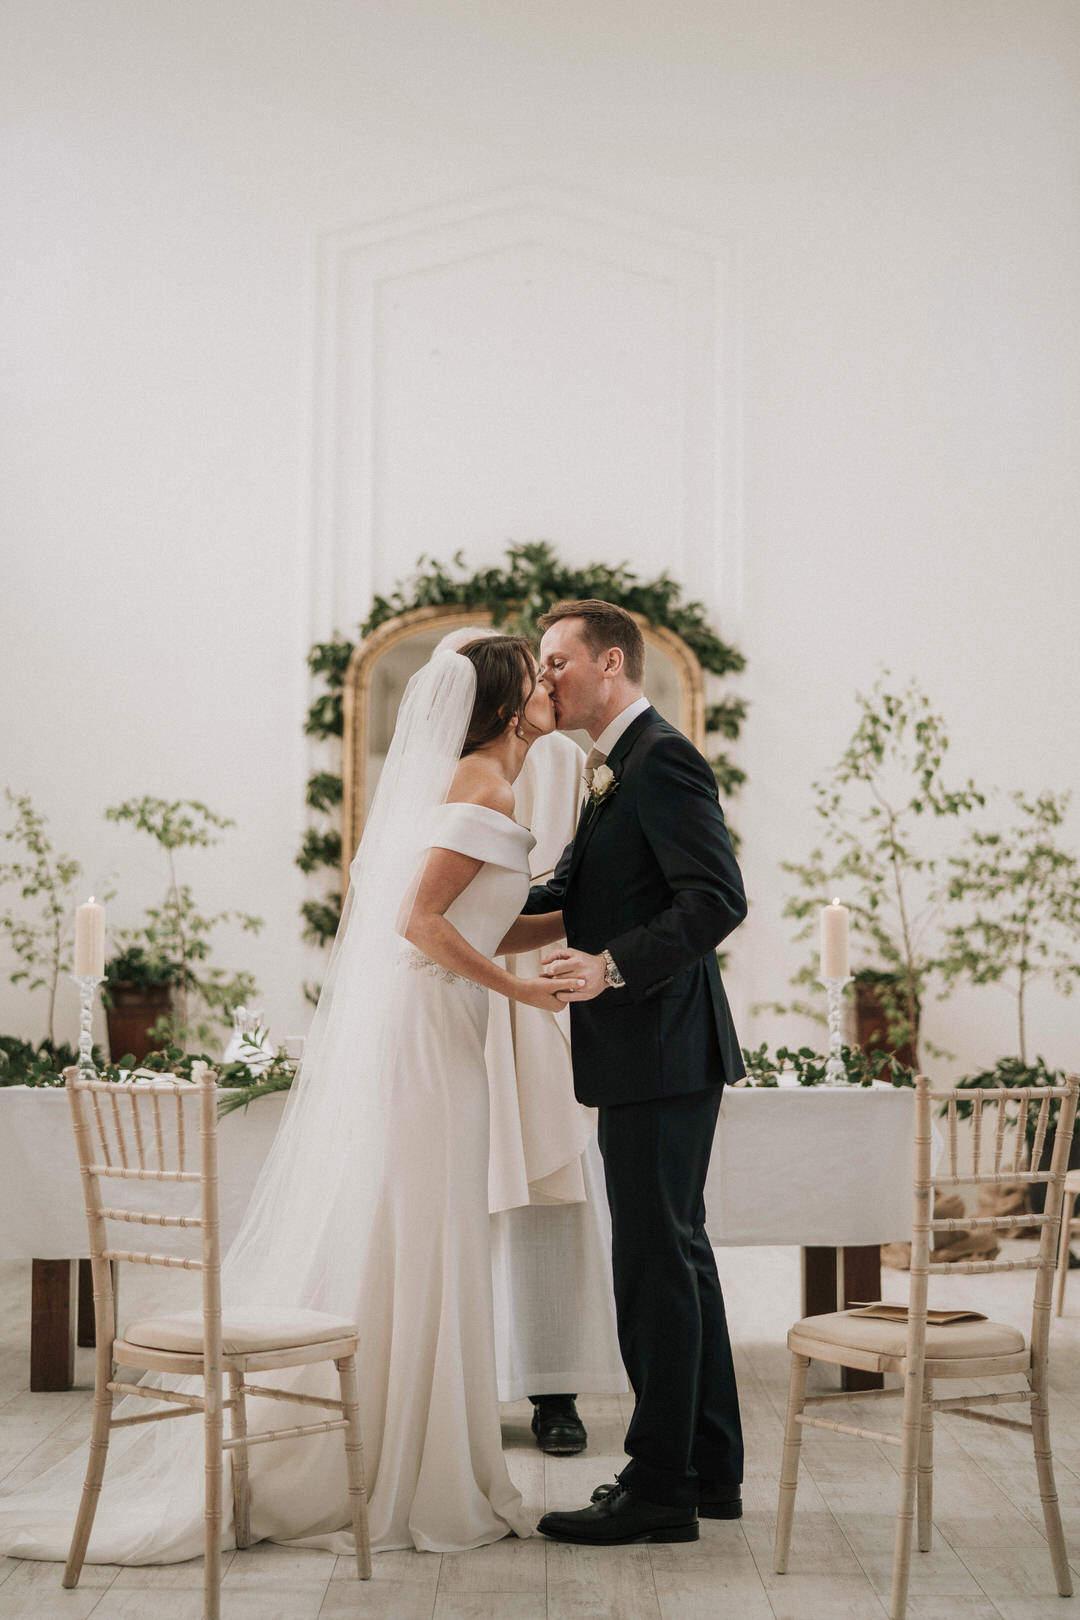 Gloster-House-wedding-photos5 5